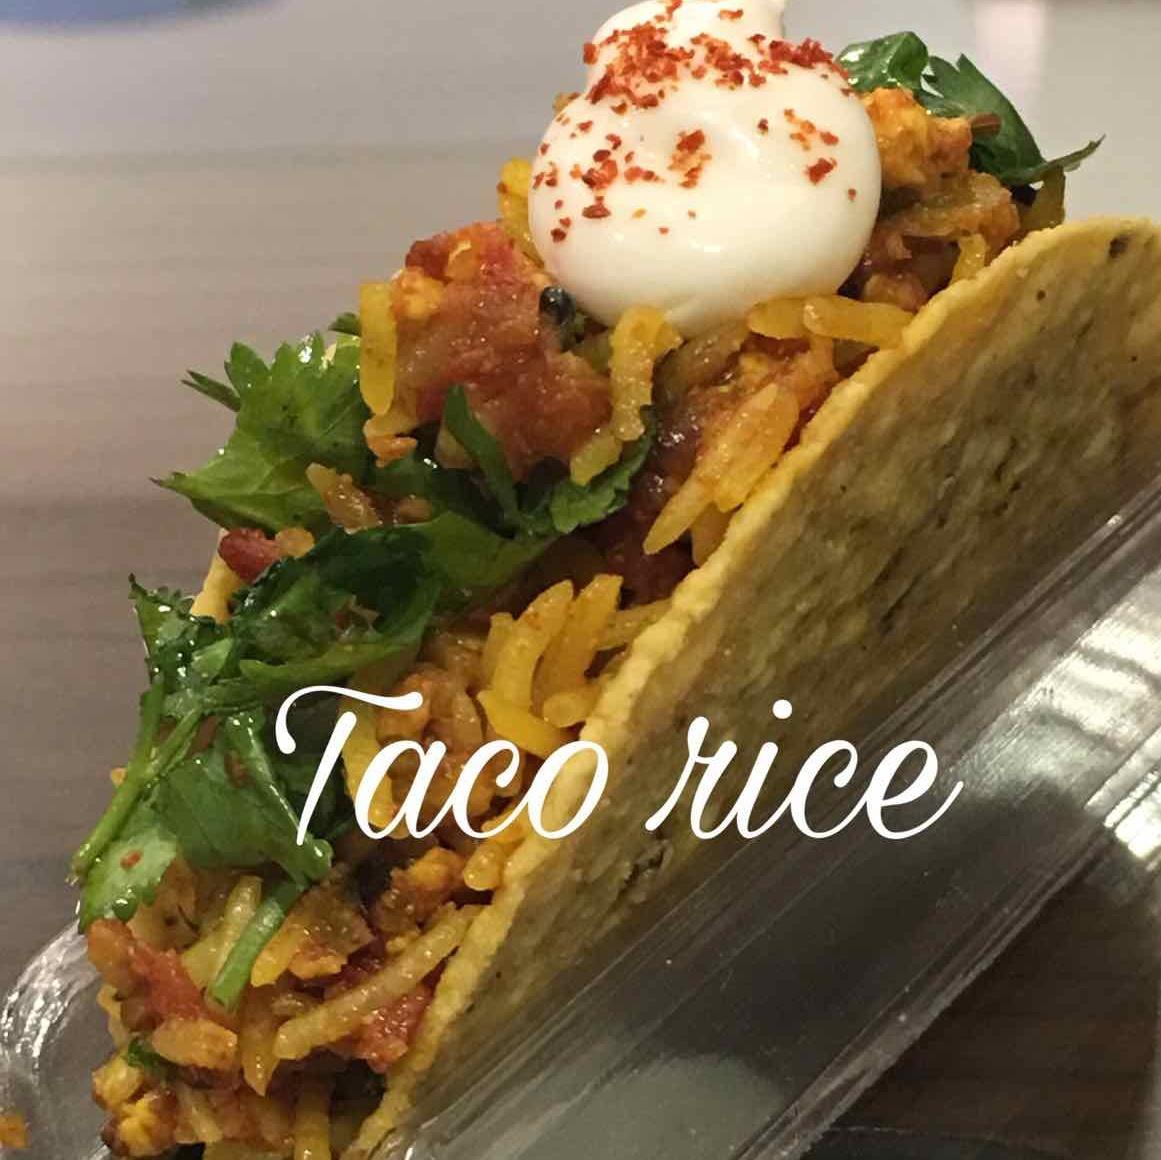 How to make Taco rice